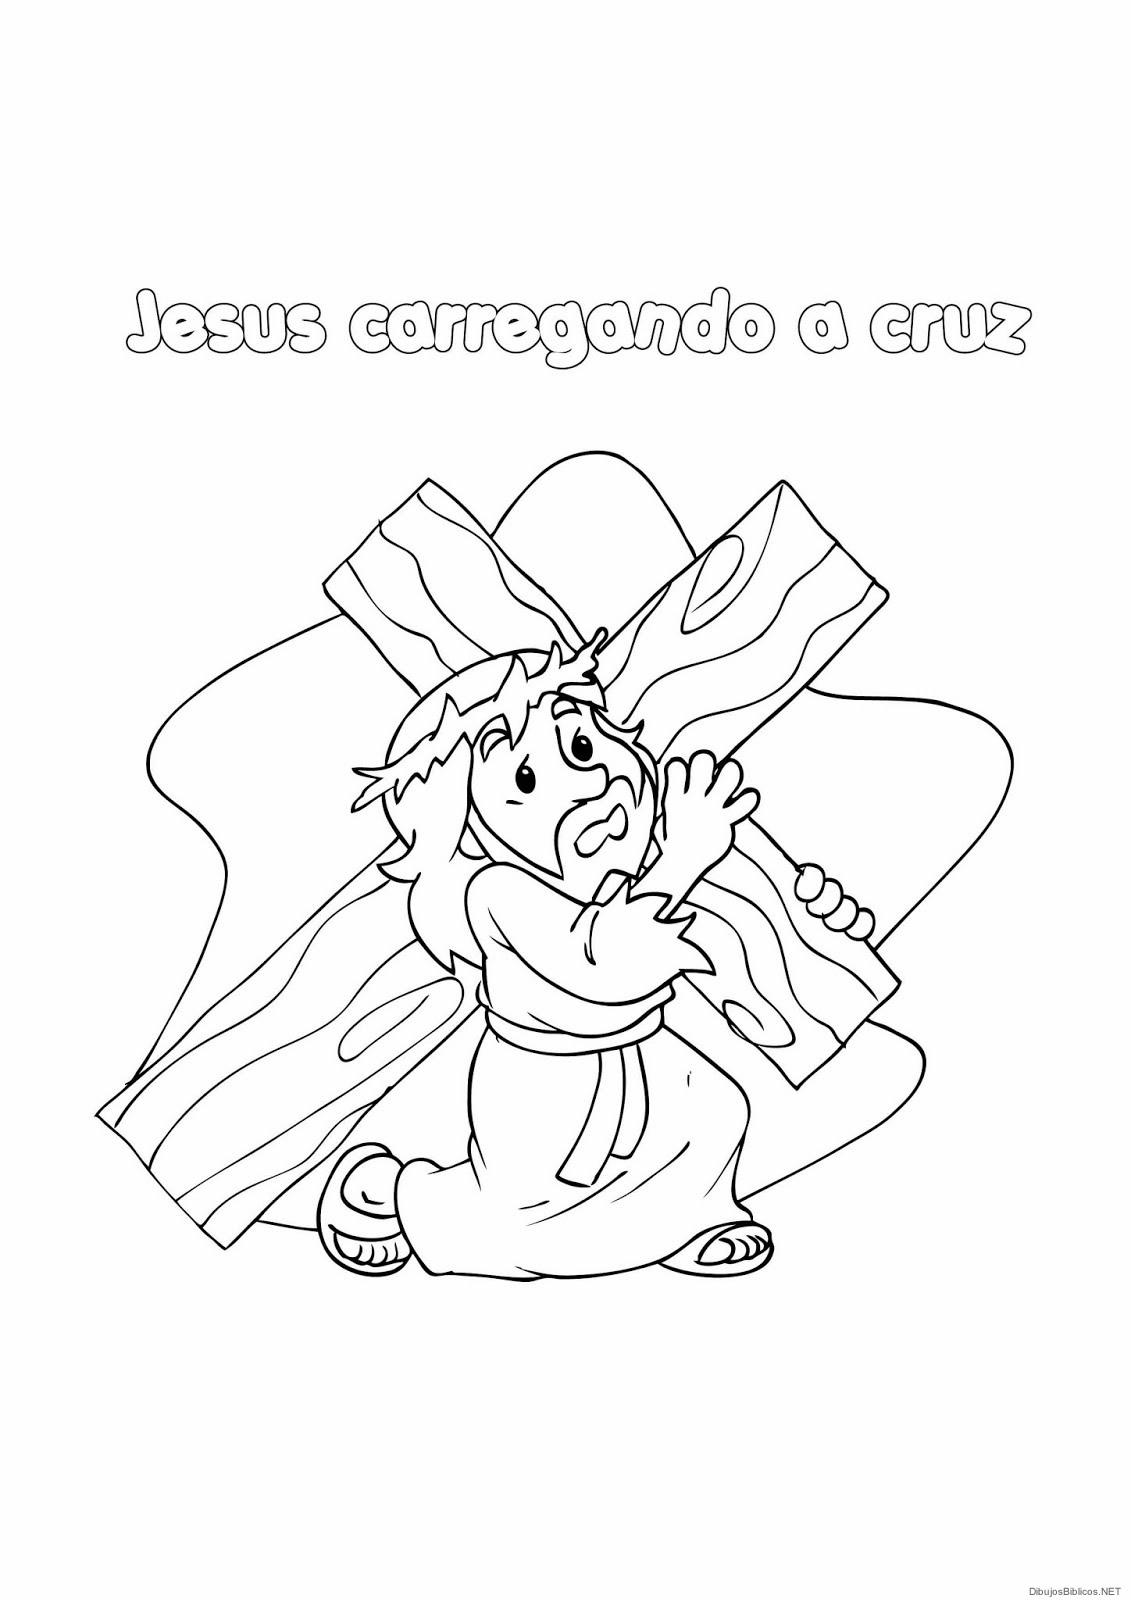 jesus_carrega_cruz.jpg